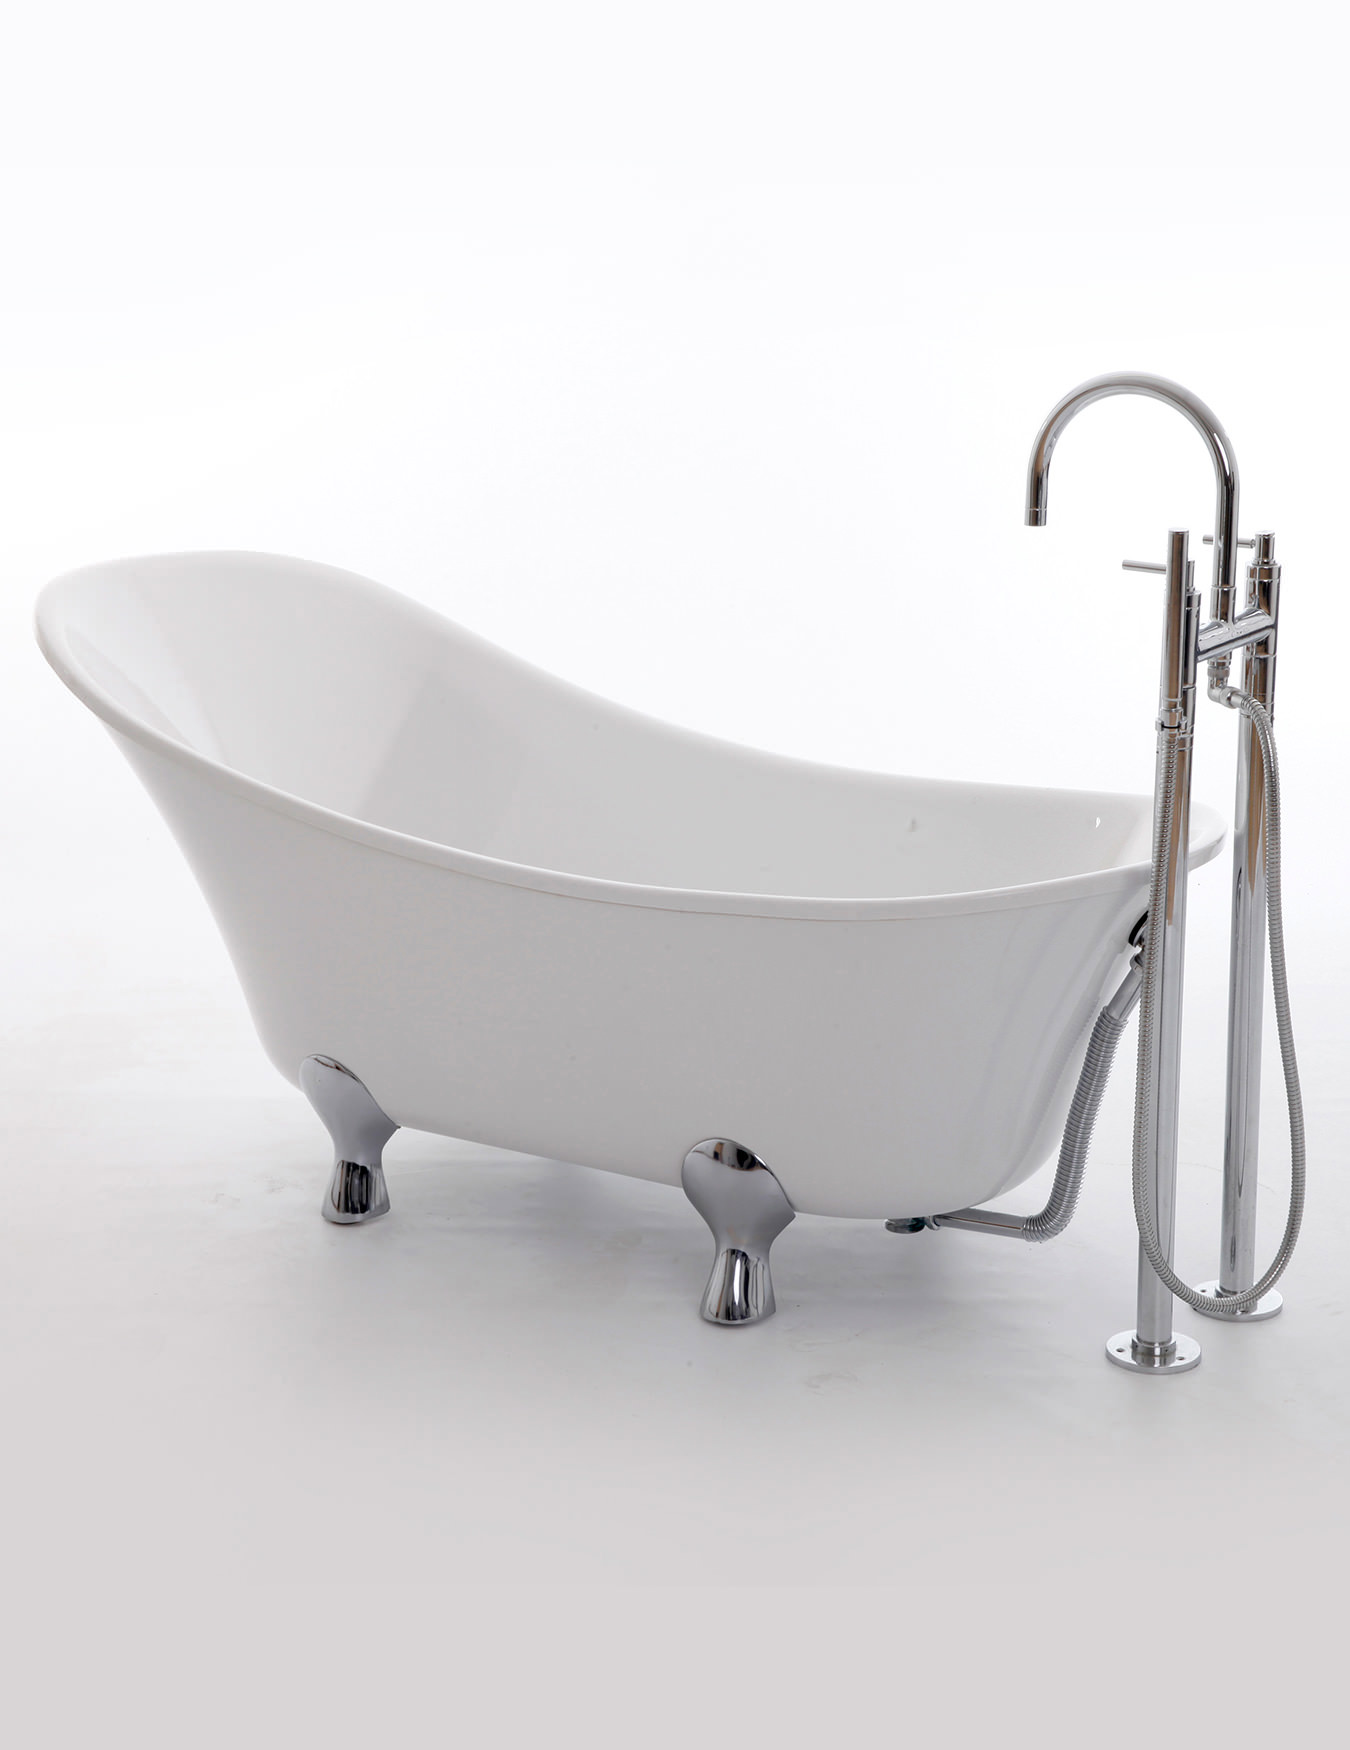 Slipper Bath Uk Royce morgan kingswood freestanding slipper bath 1750 x 740mm royce morgan kingswood single ended slipper bath 1750 x 740mm sisterspd